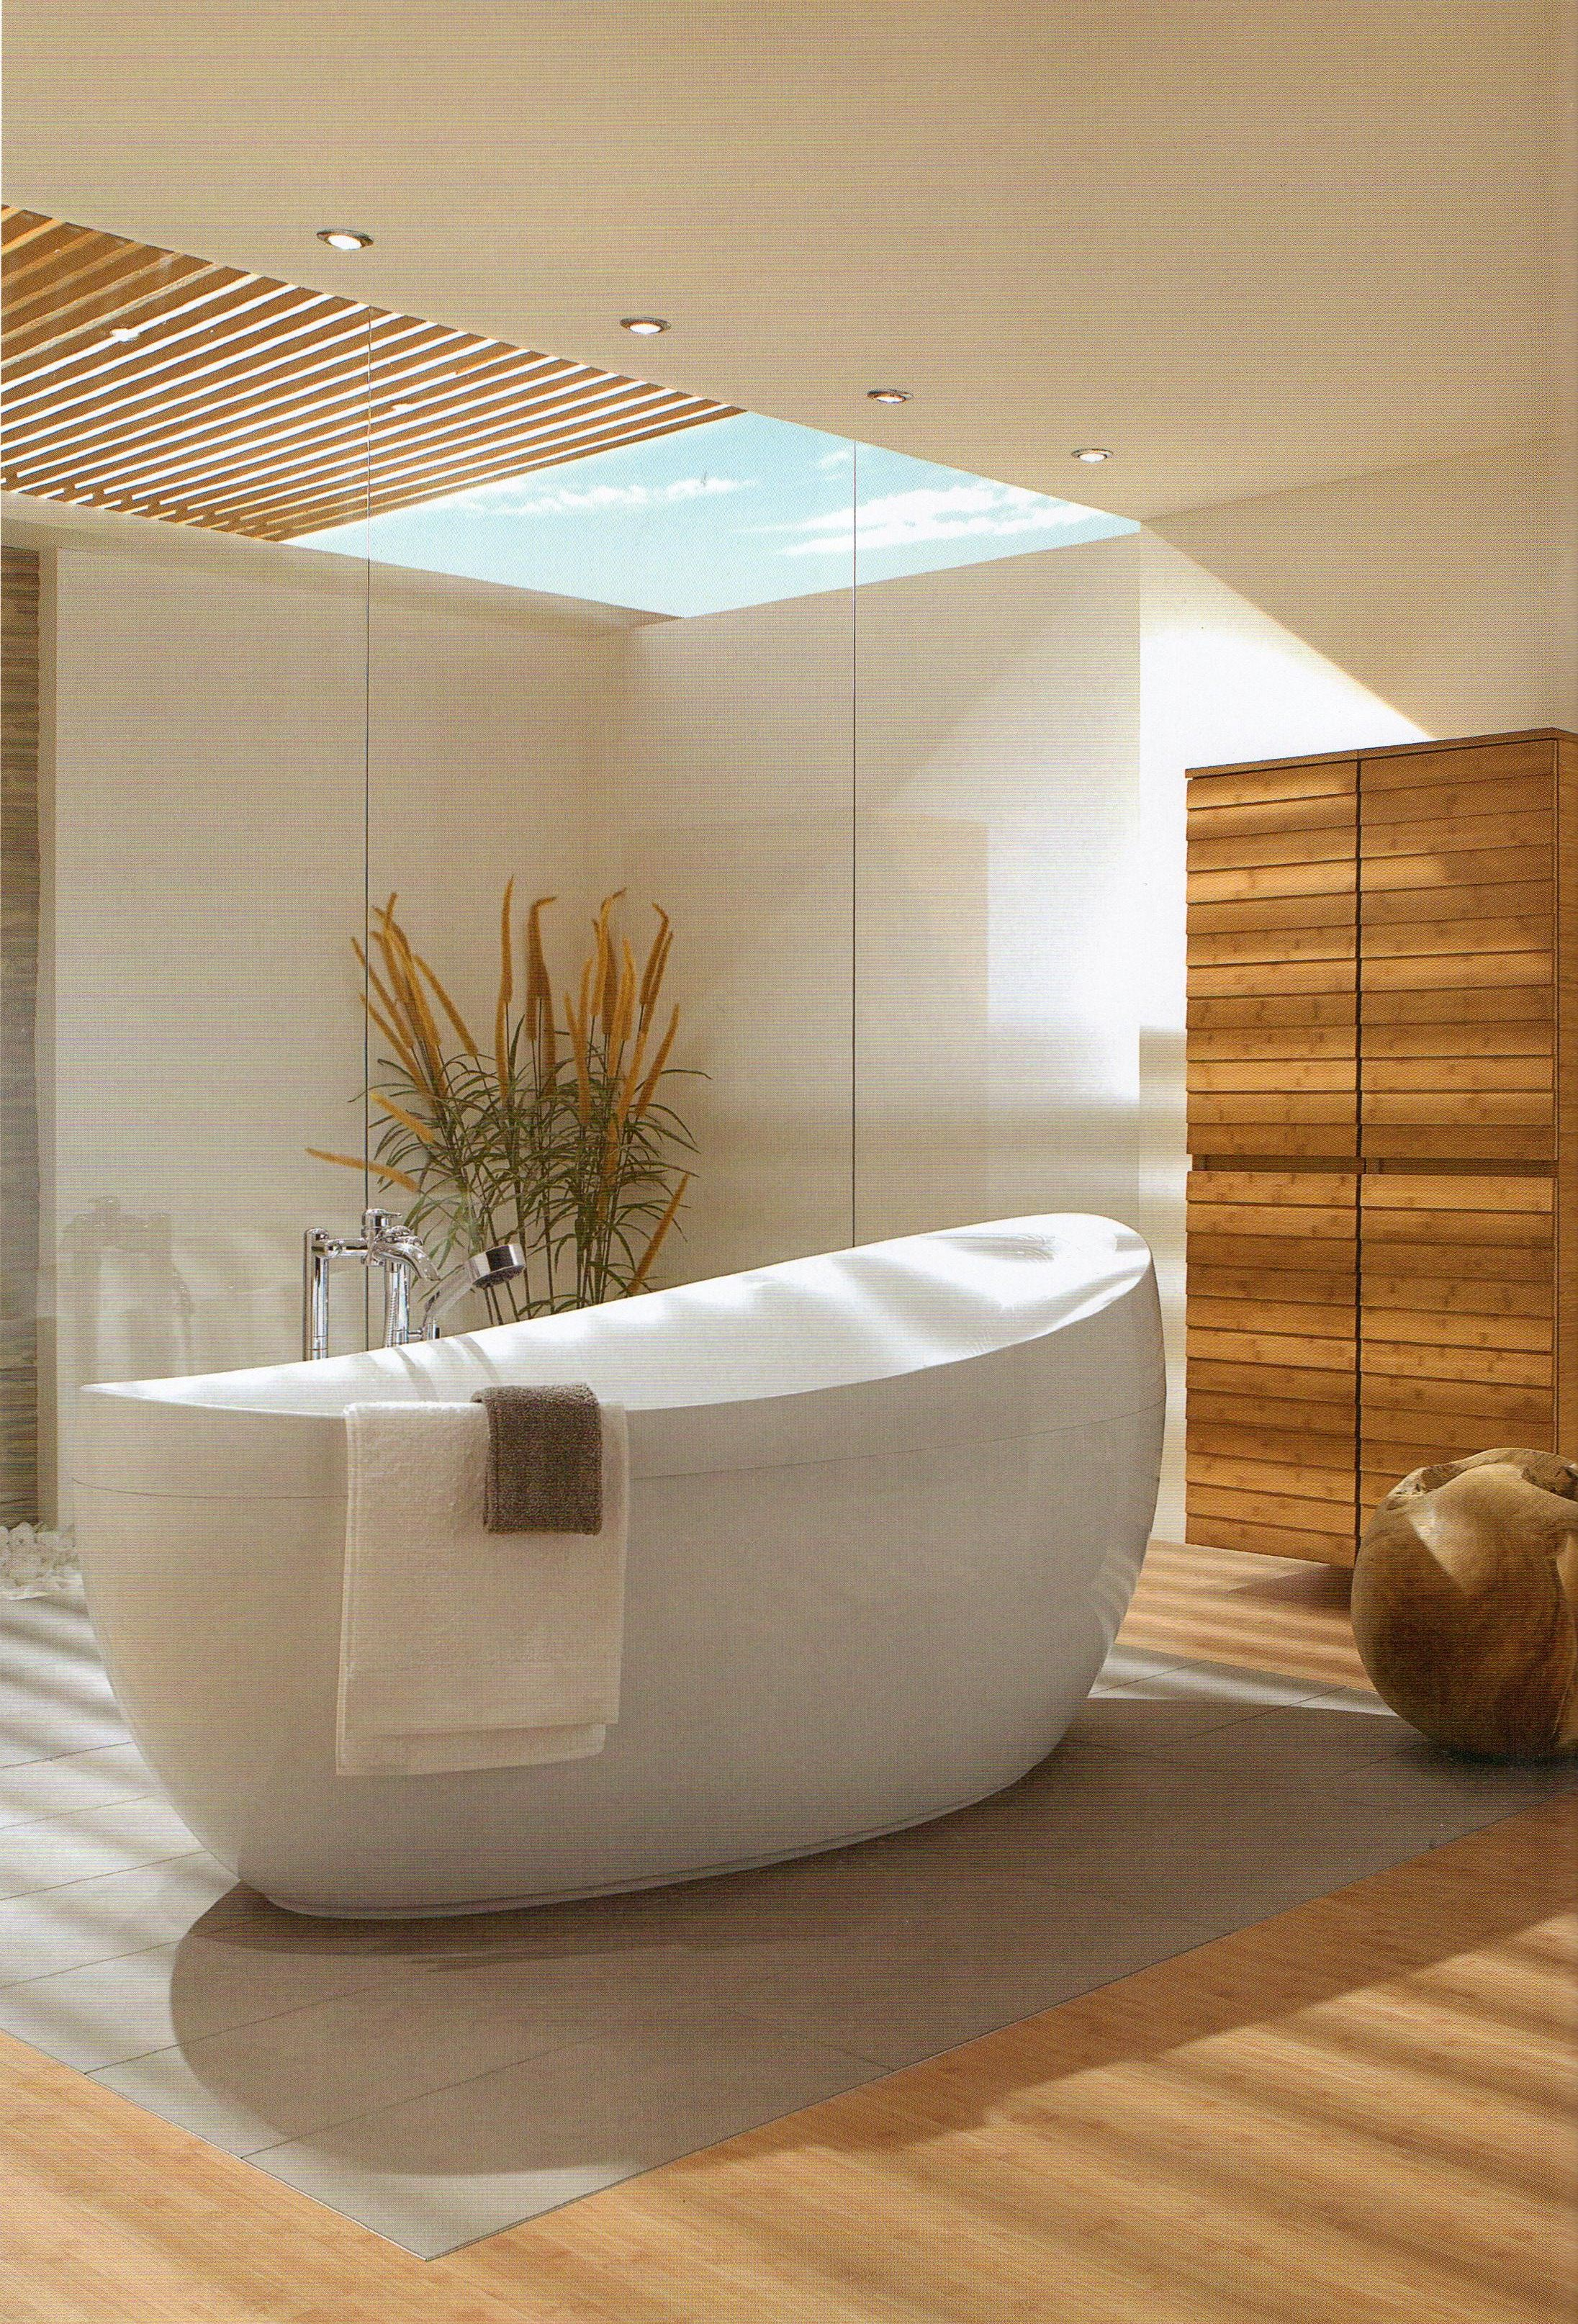 Modern Bathroom Design Product By Villeroy And Boch Bathroom